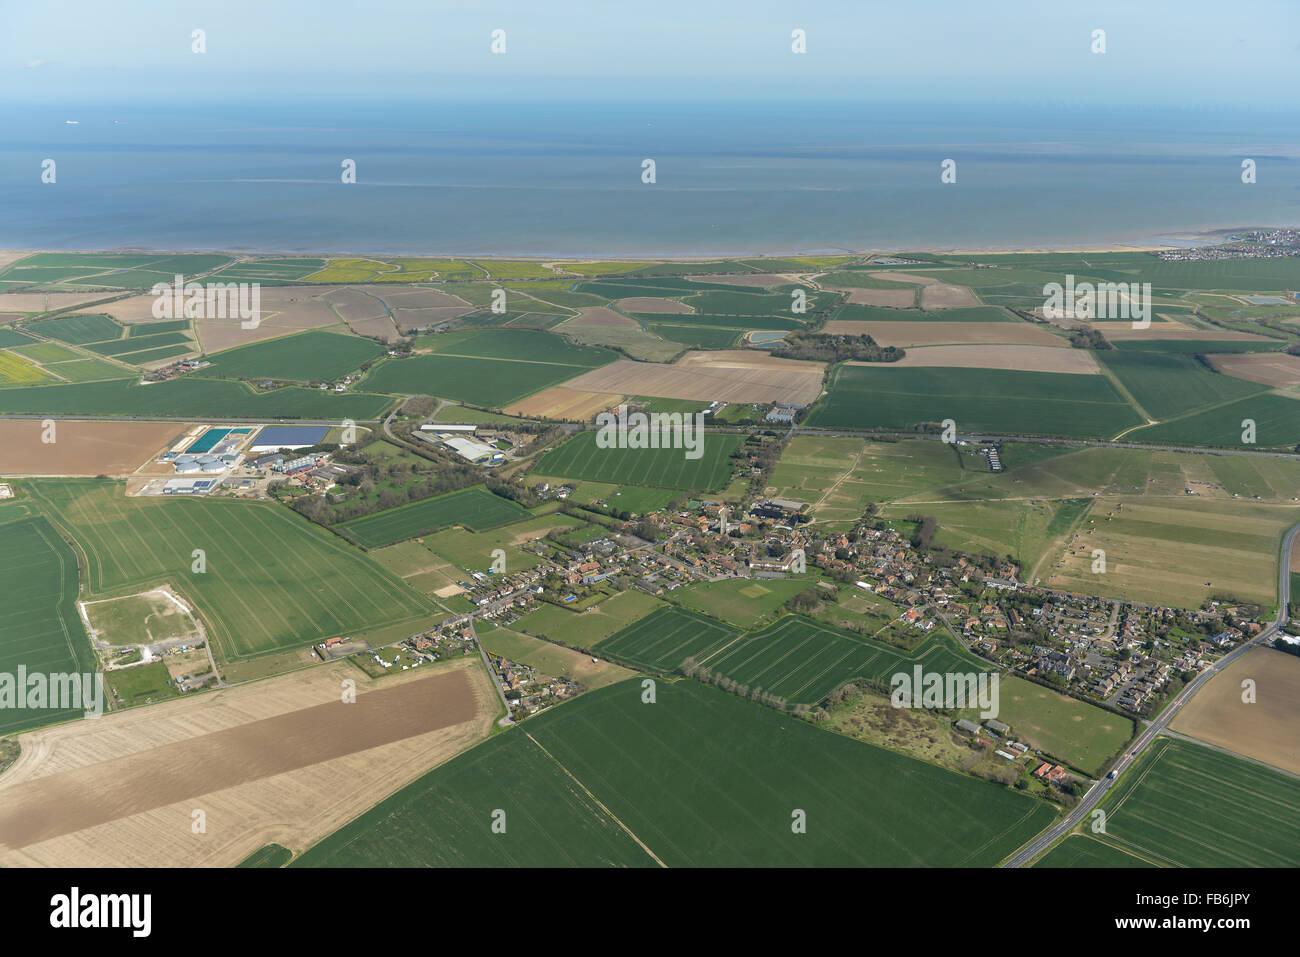 An aerial view of St Nicholas-at-Wade, Kent - Stock Image